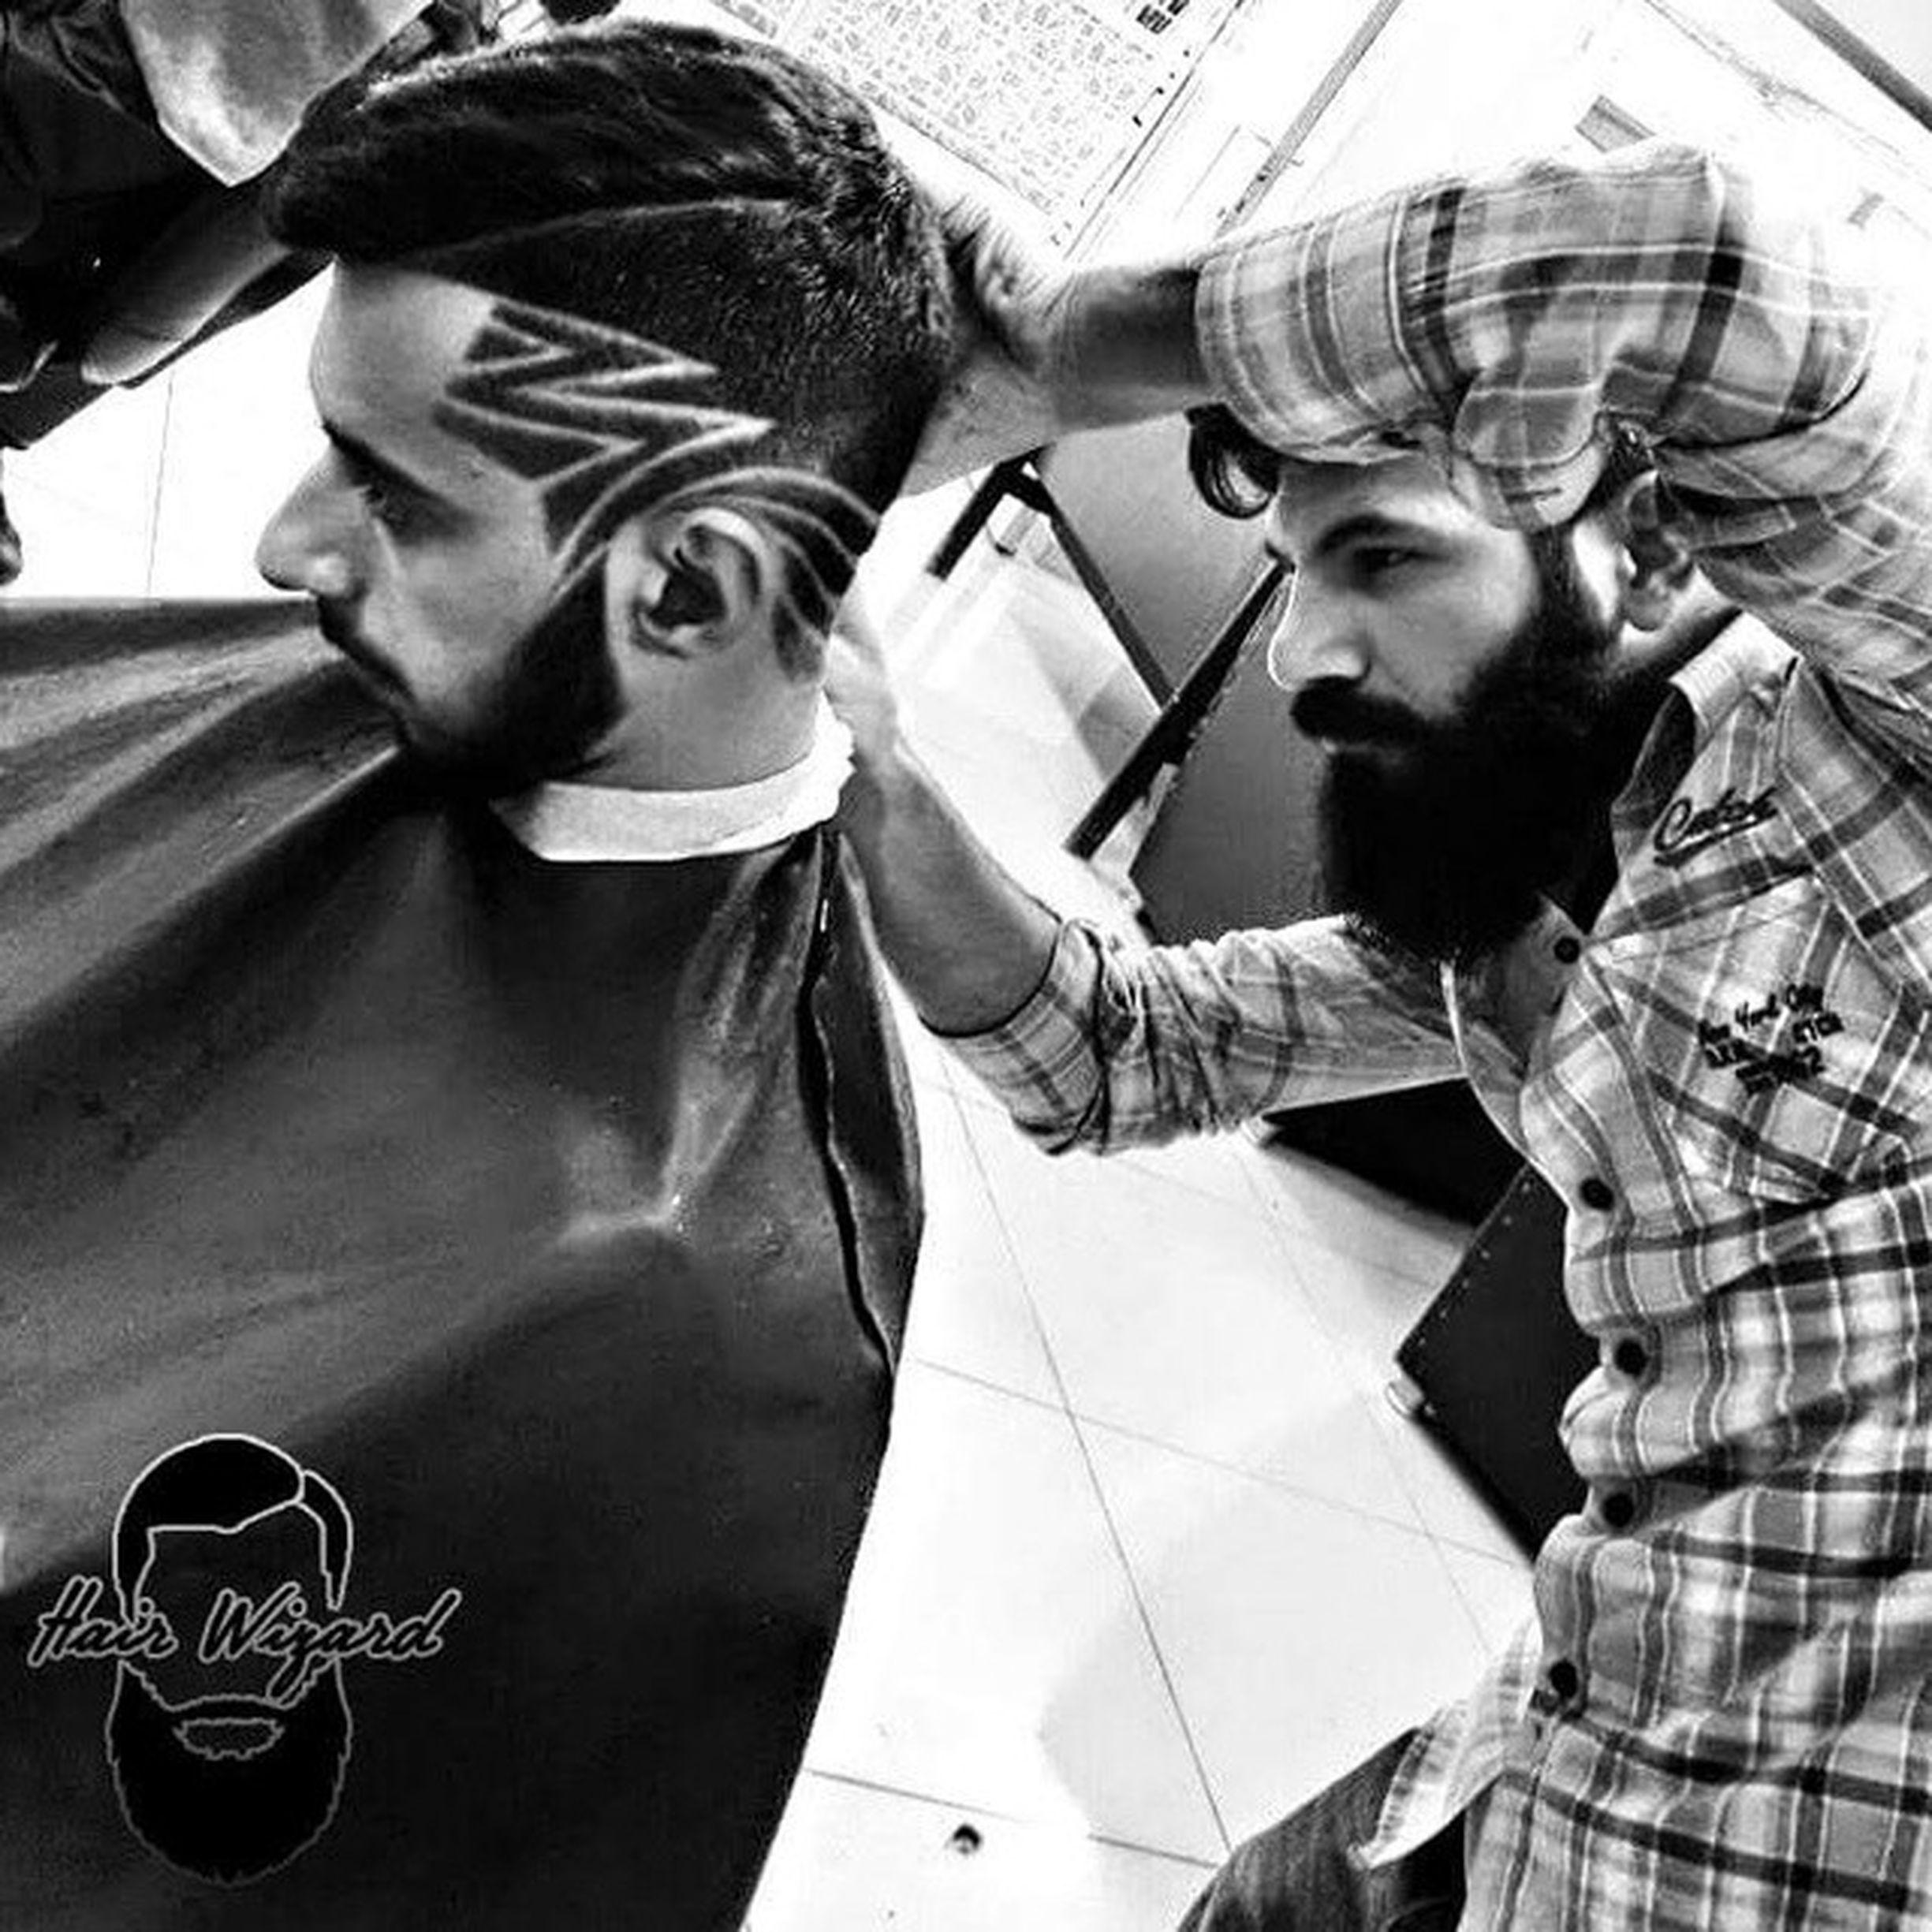 Hairwizard Fashionista Fashionhairstylist Hair Hairstyle Hairstylist Instagood Instadaily Instamood Instalikes Instalife Burnette Beard Beardgang Hairline Hairdrawing Coolhairstyle Blackhair Curlyhair Blondehair парикмахер брюнетка Мастер_волоc МастерКласс стилист barbero peinado asistente_de_pelo